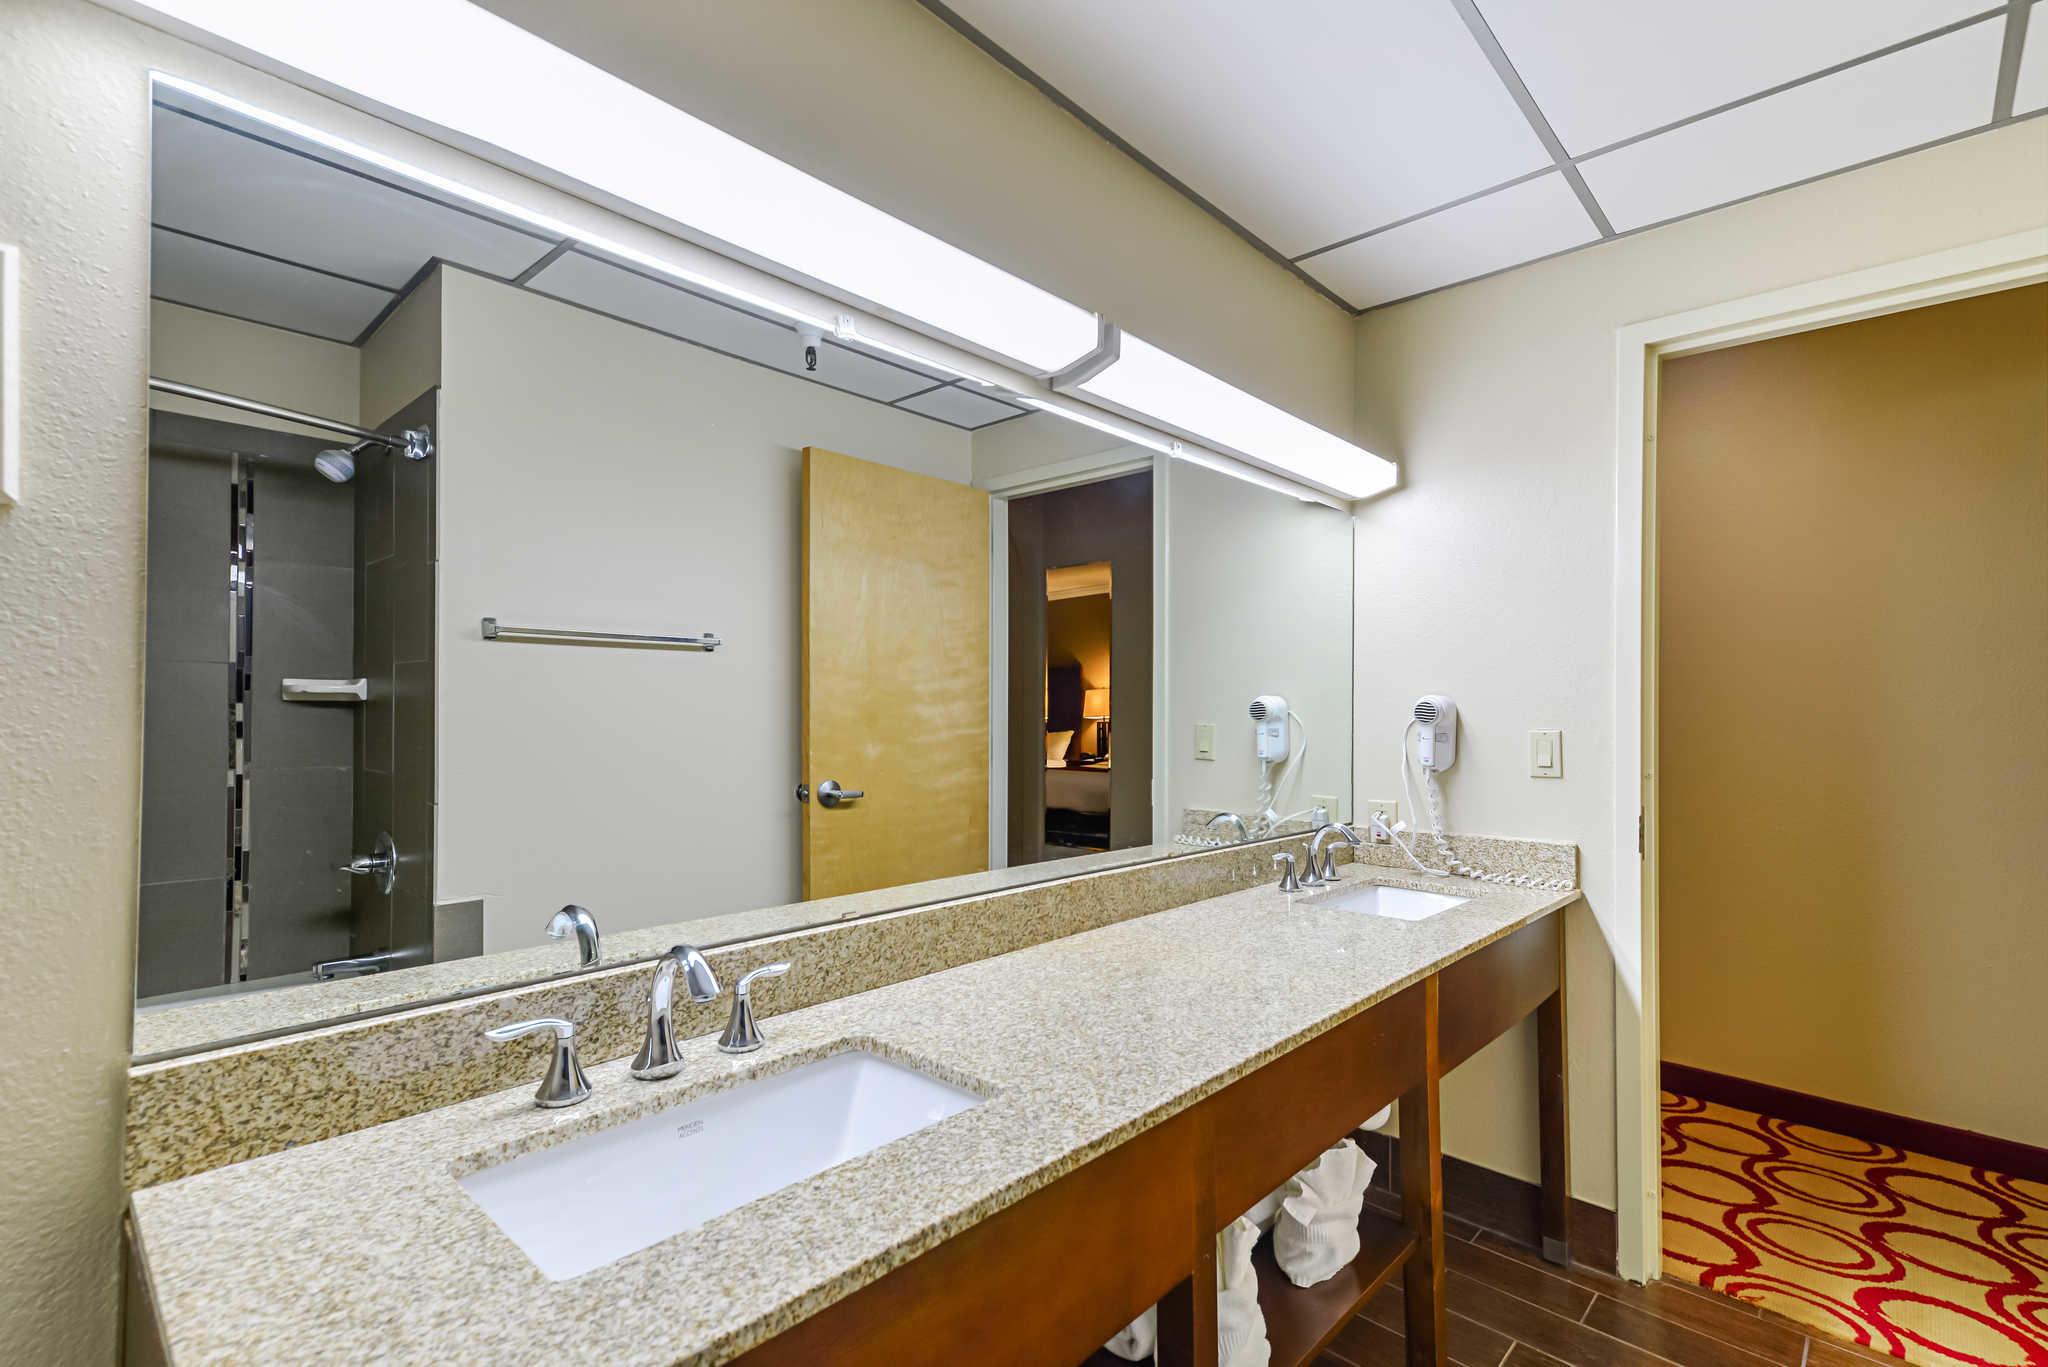 Comfort Suites image 39